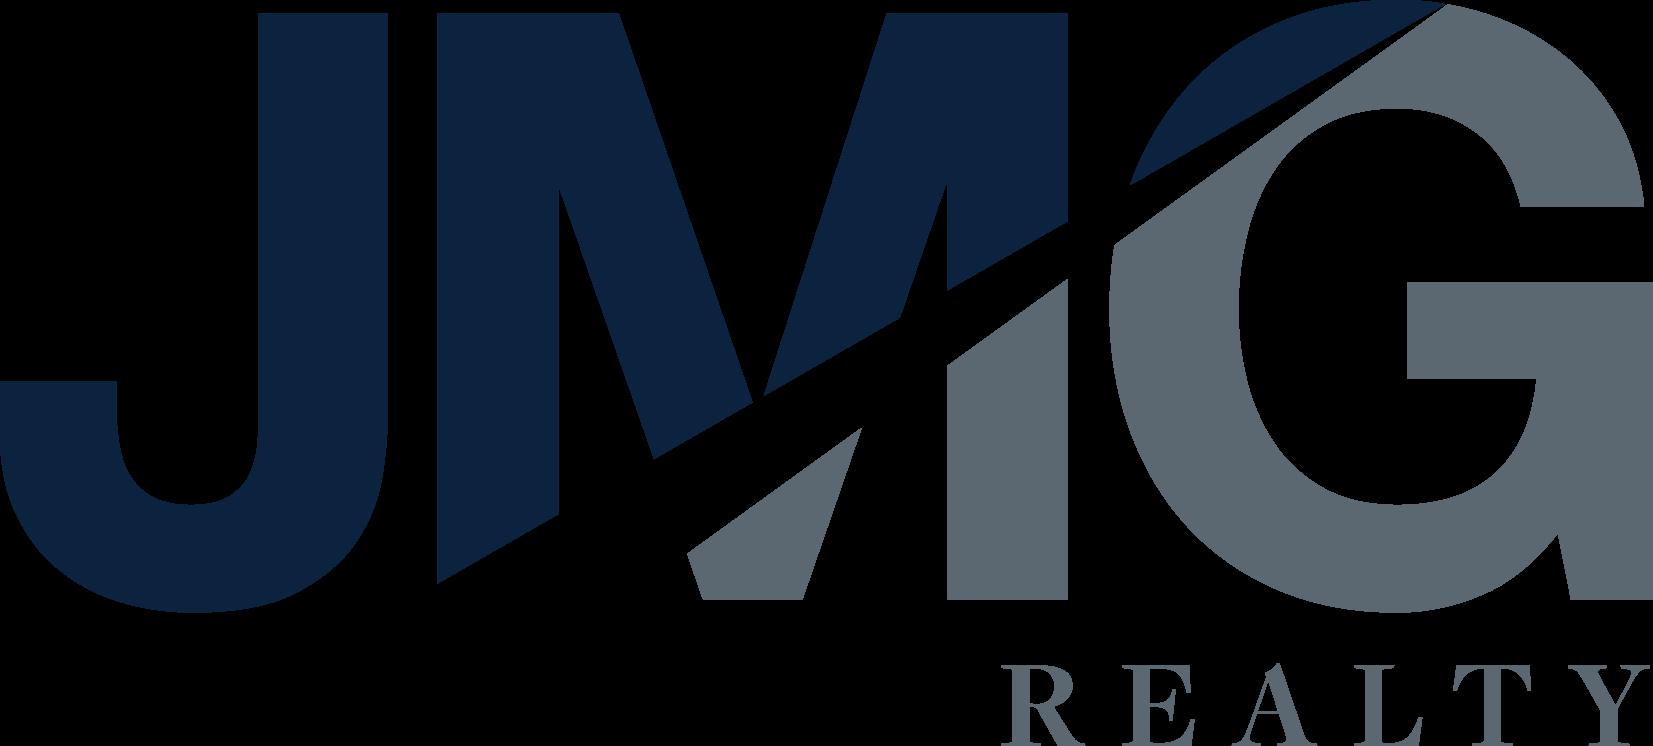 JMG Realty Logo